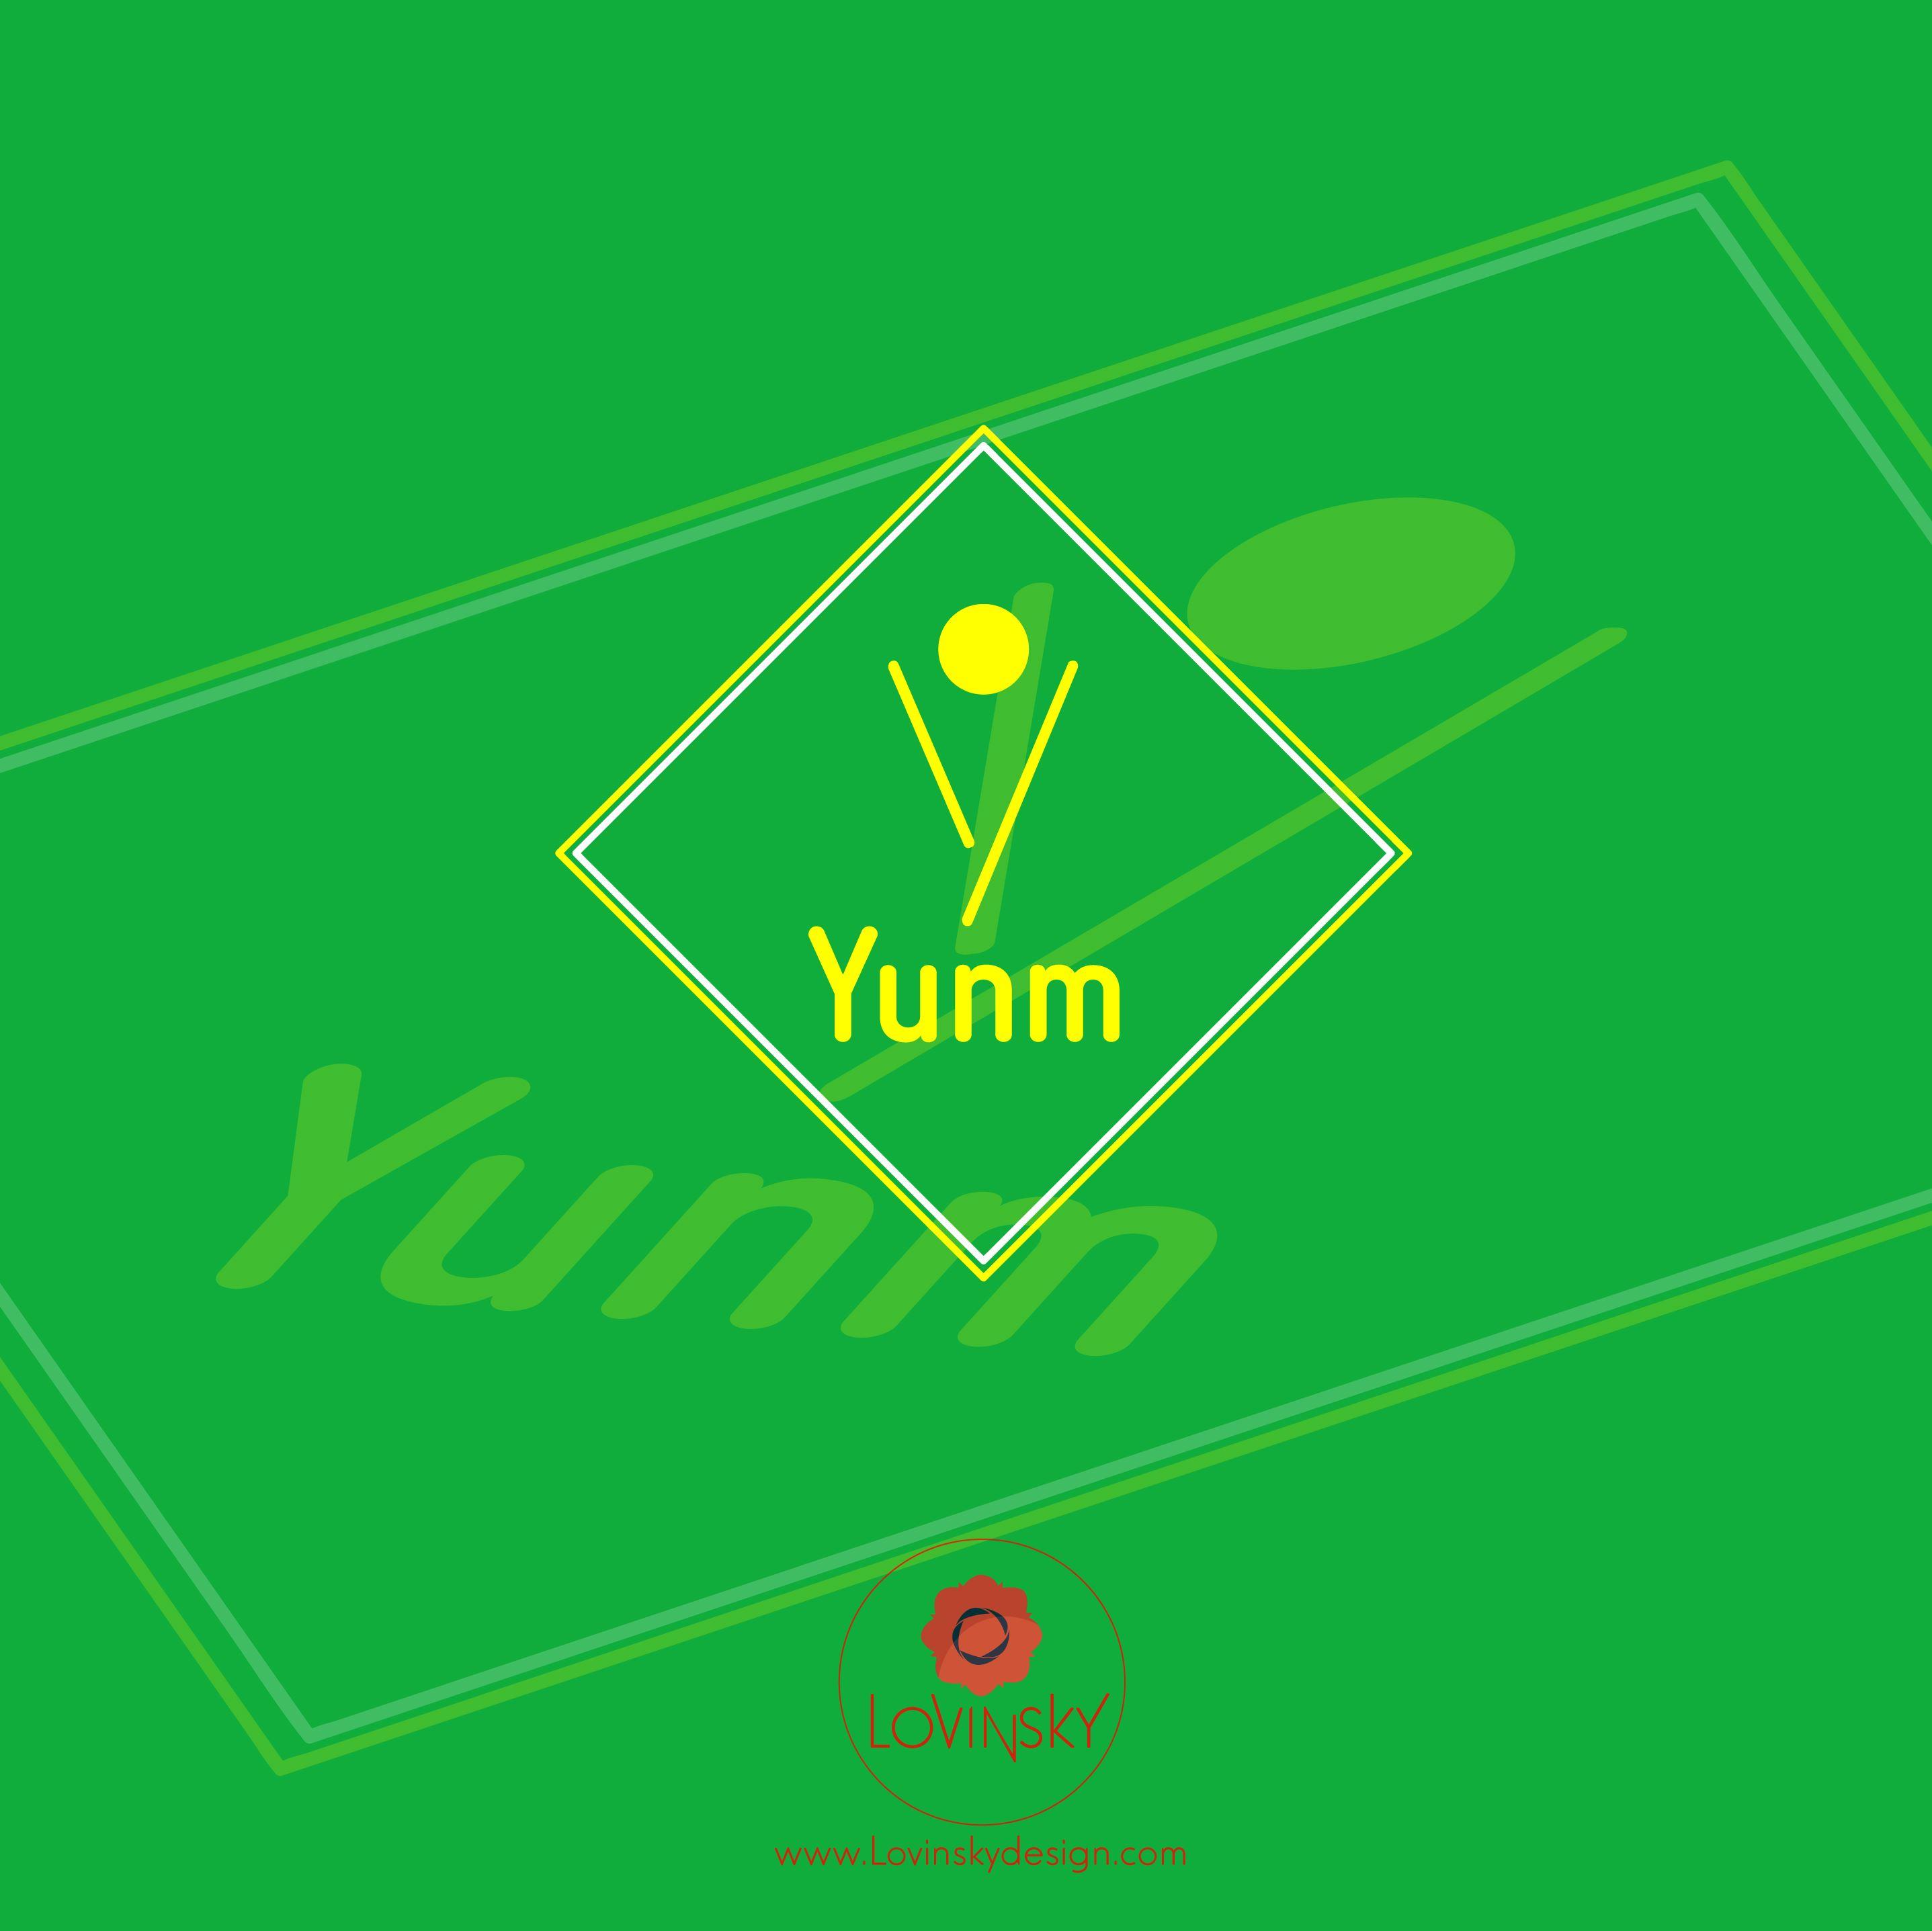 yunm logo lovinsky graphiste webdesigner freelance nantes 44